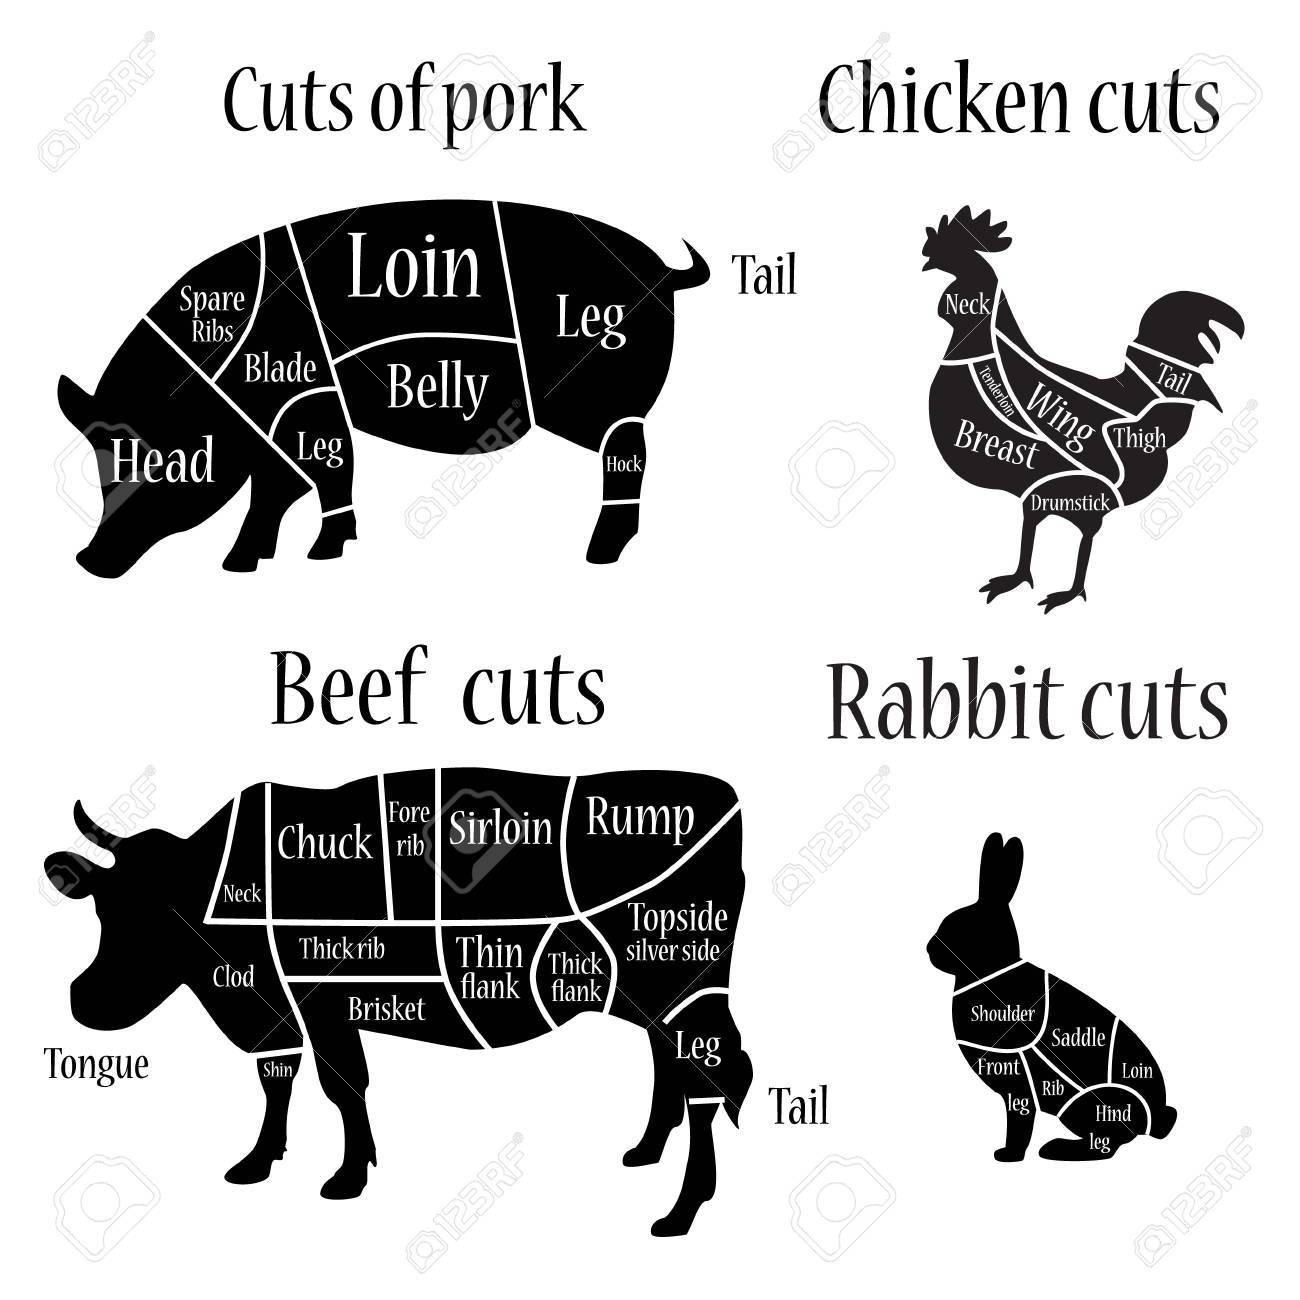 60655288 raster illustration chicken rabbit cow and pork cuts diagram or chart chicken pork cow black silhoue raster illustration chicken, rabbit, cow and pork cuts diagram